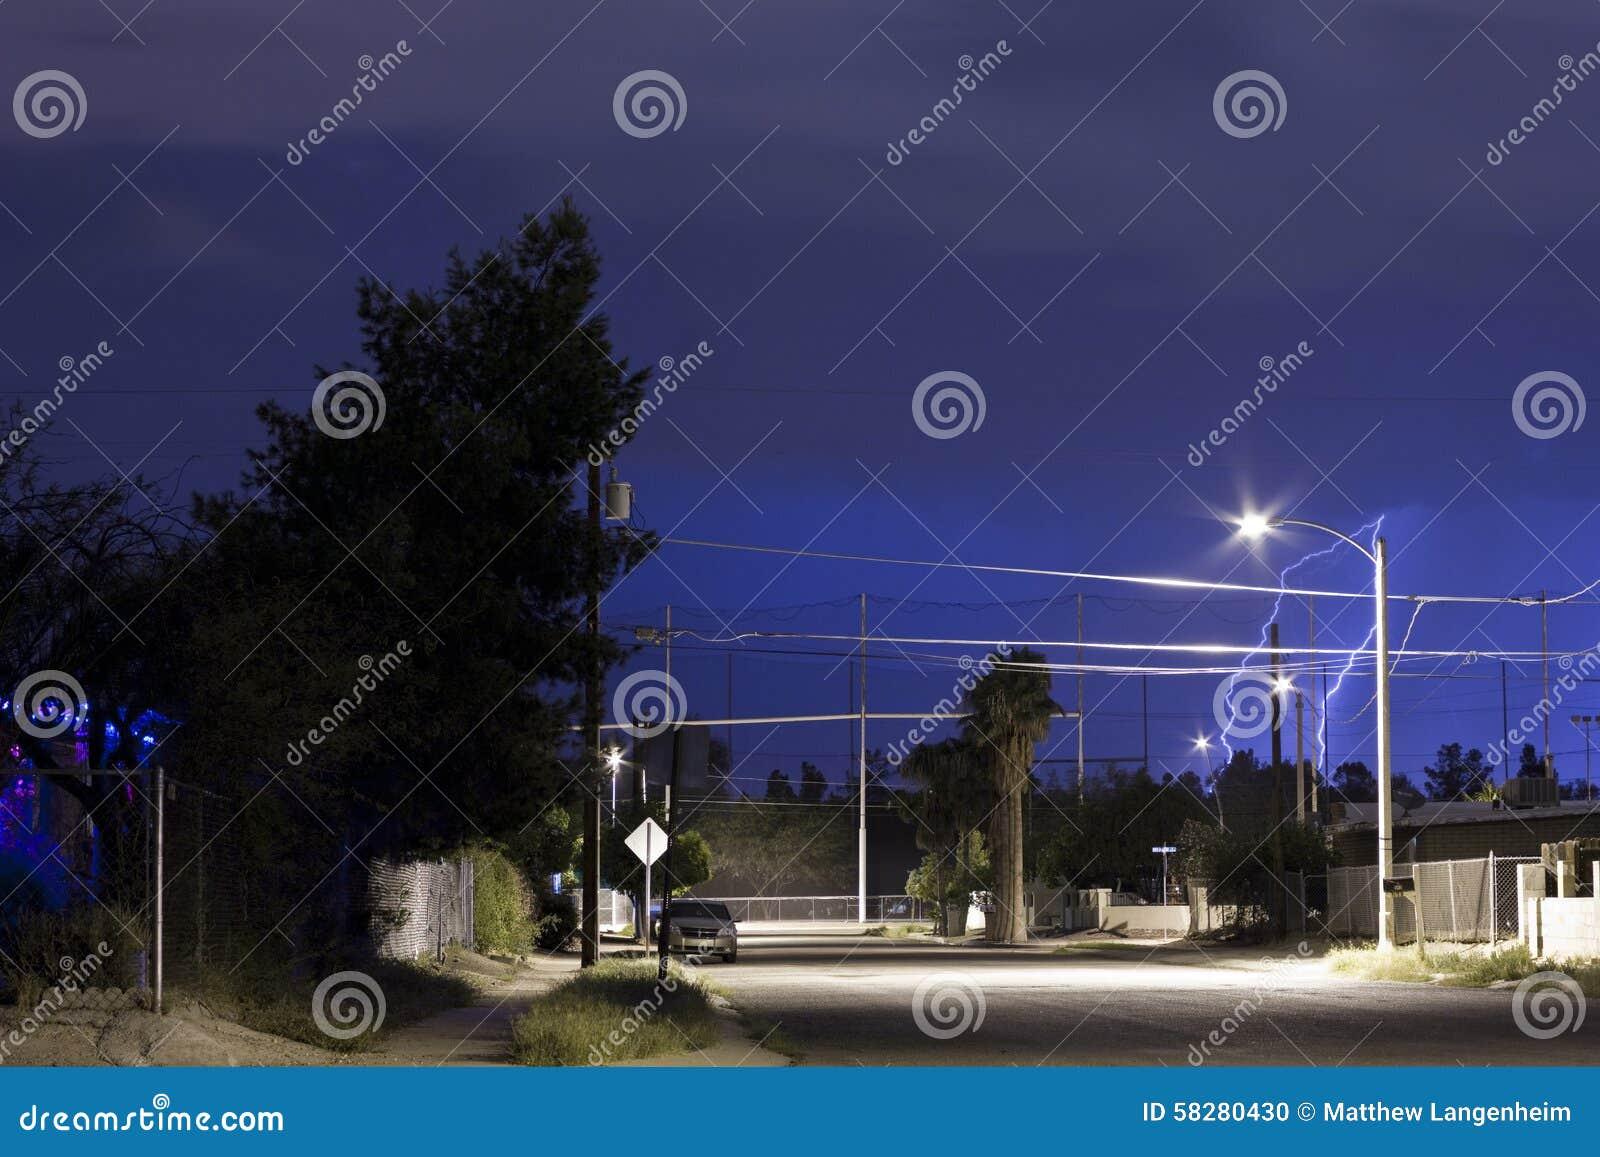 lightning over tucson az neighborhood at night time stock photo